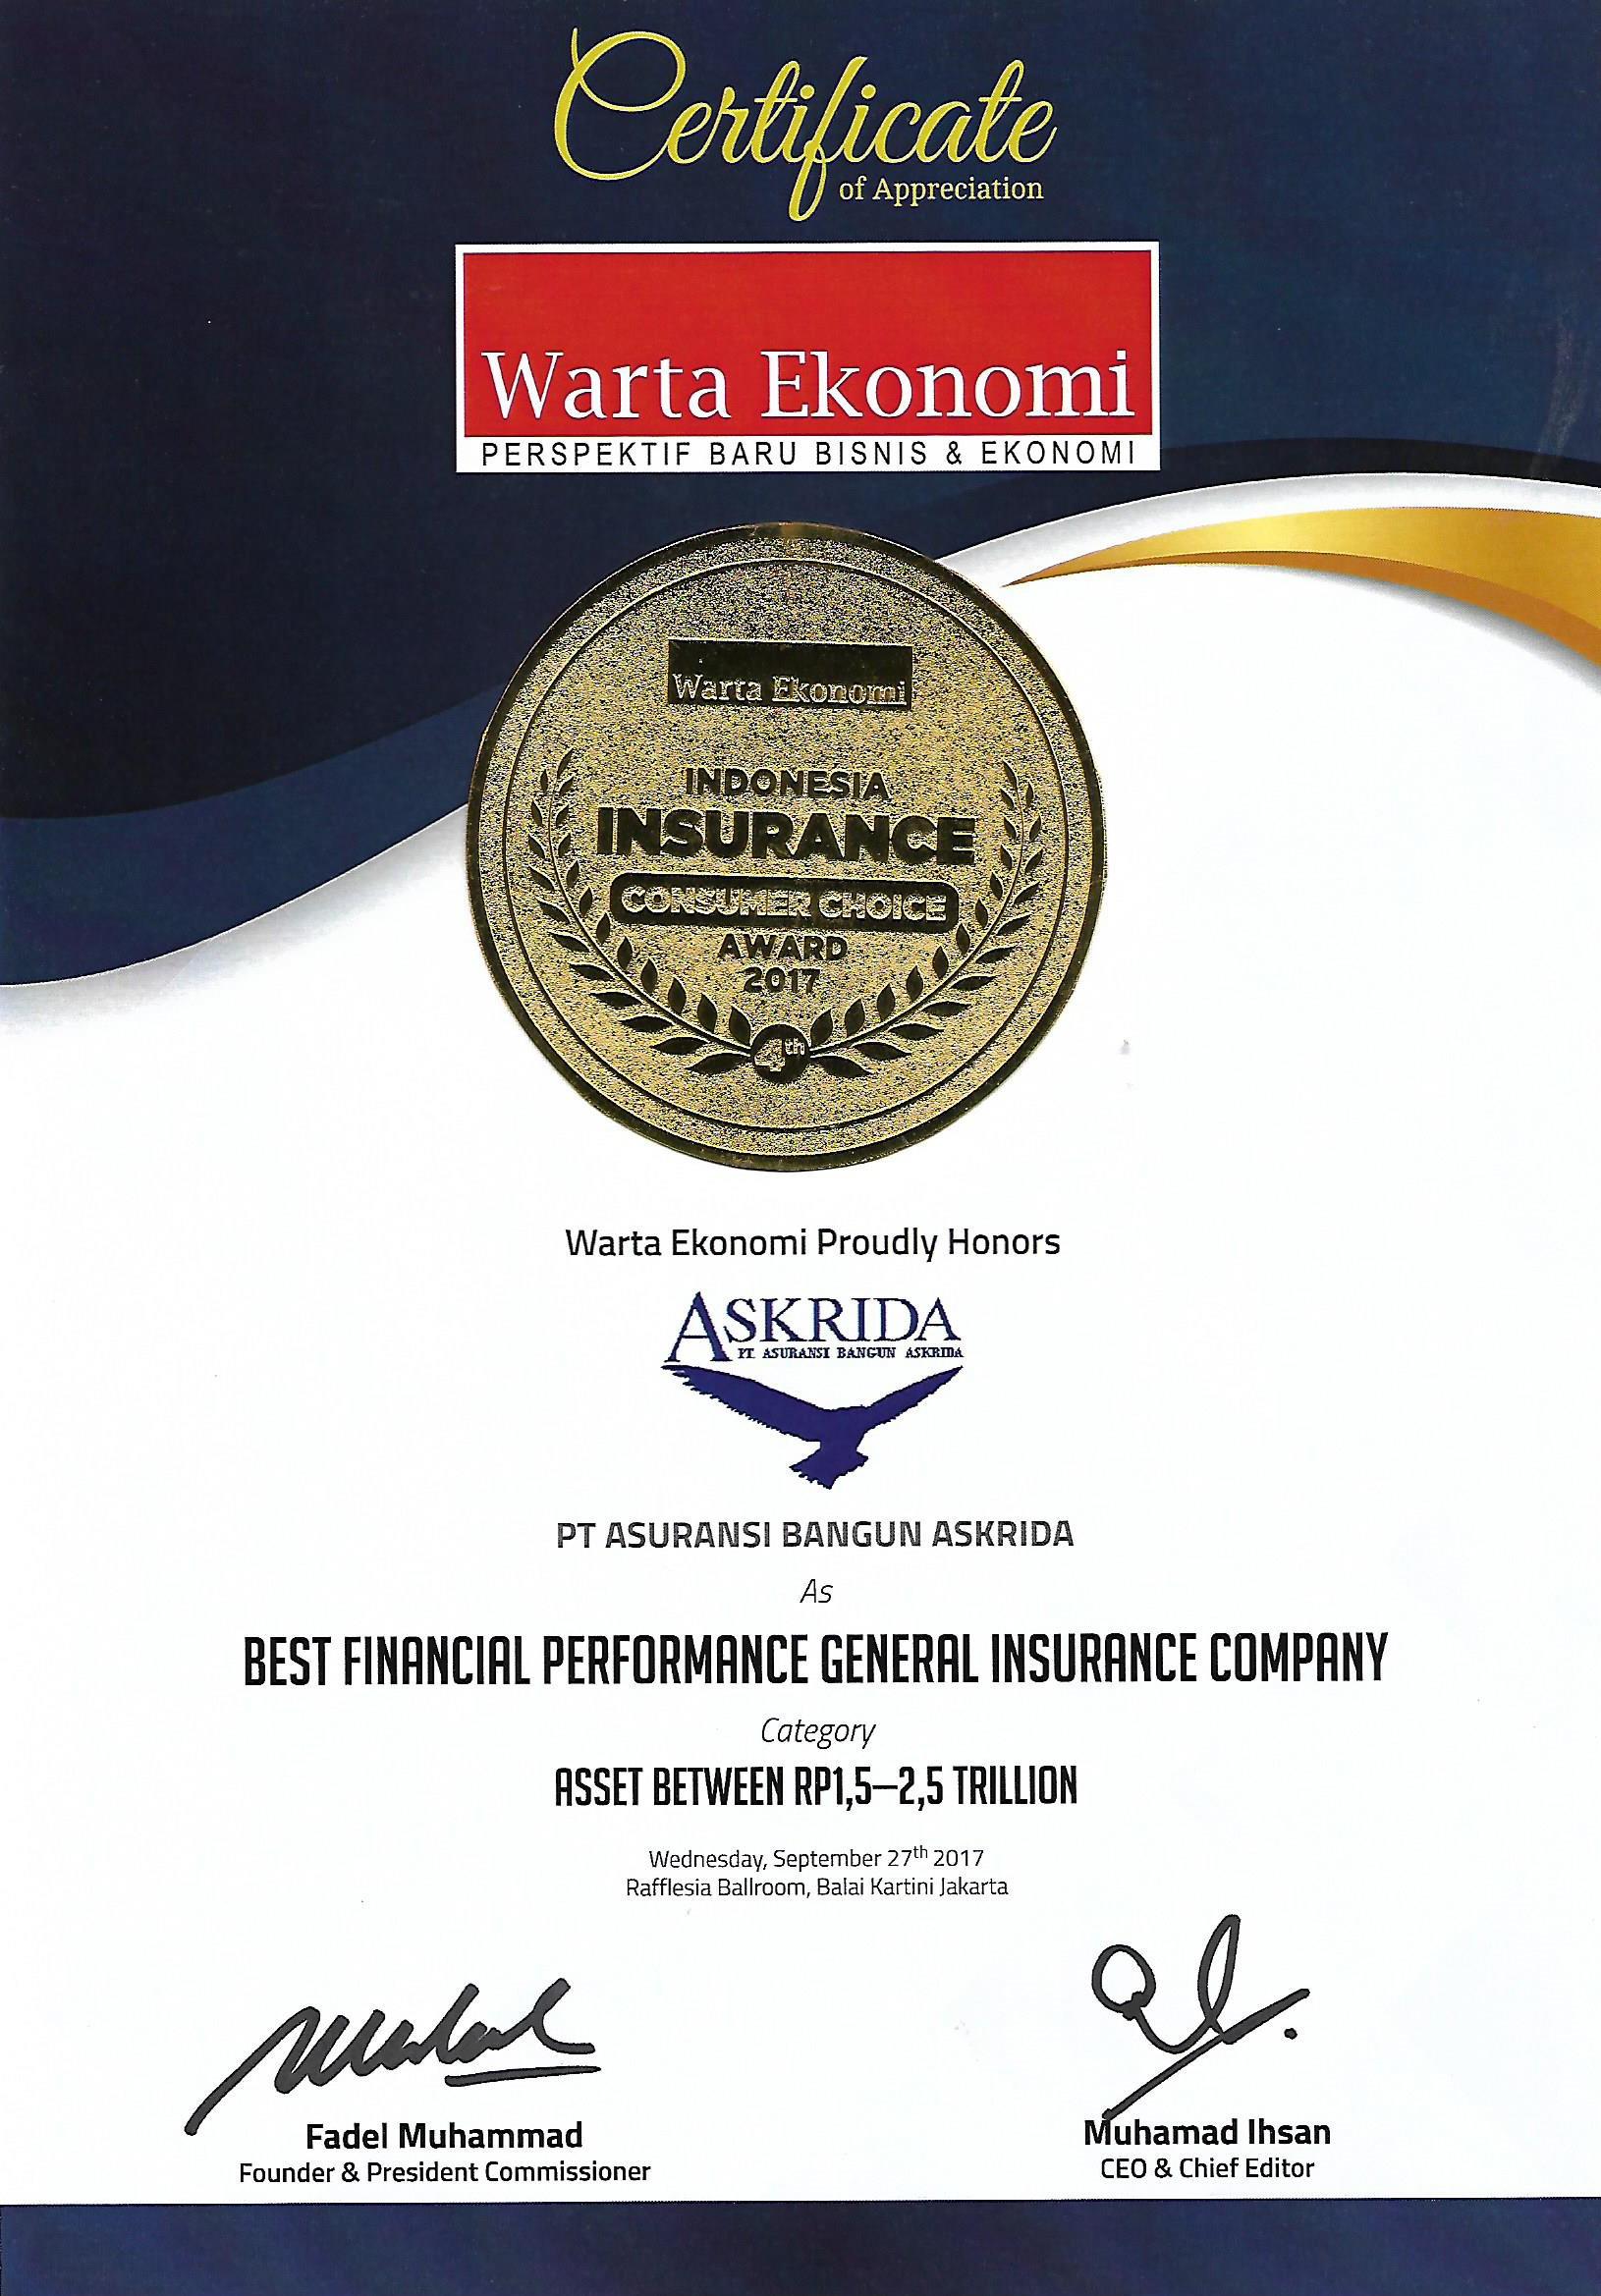 PENGHARGAAN BEST FINANCIAL PERFORMANCE GENERAL INSURANCE COMPANY 2017 (WARTA EKONOMI)